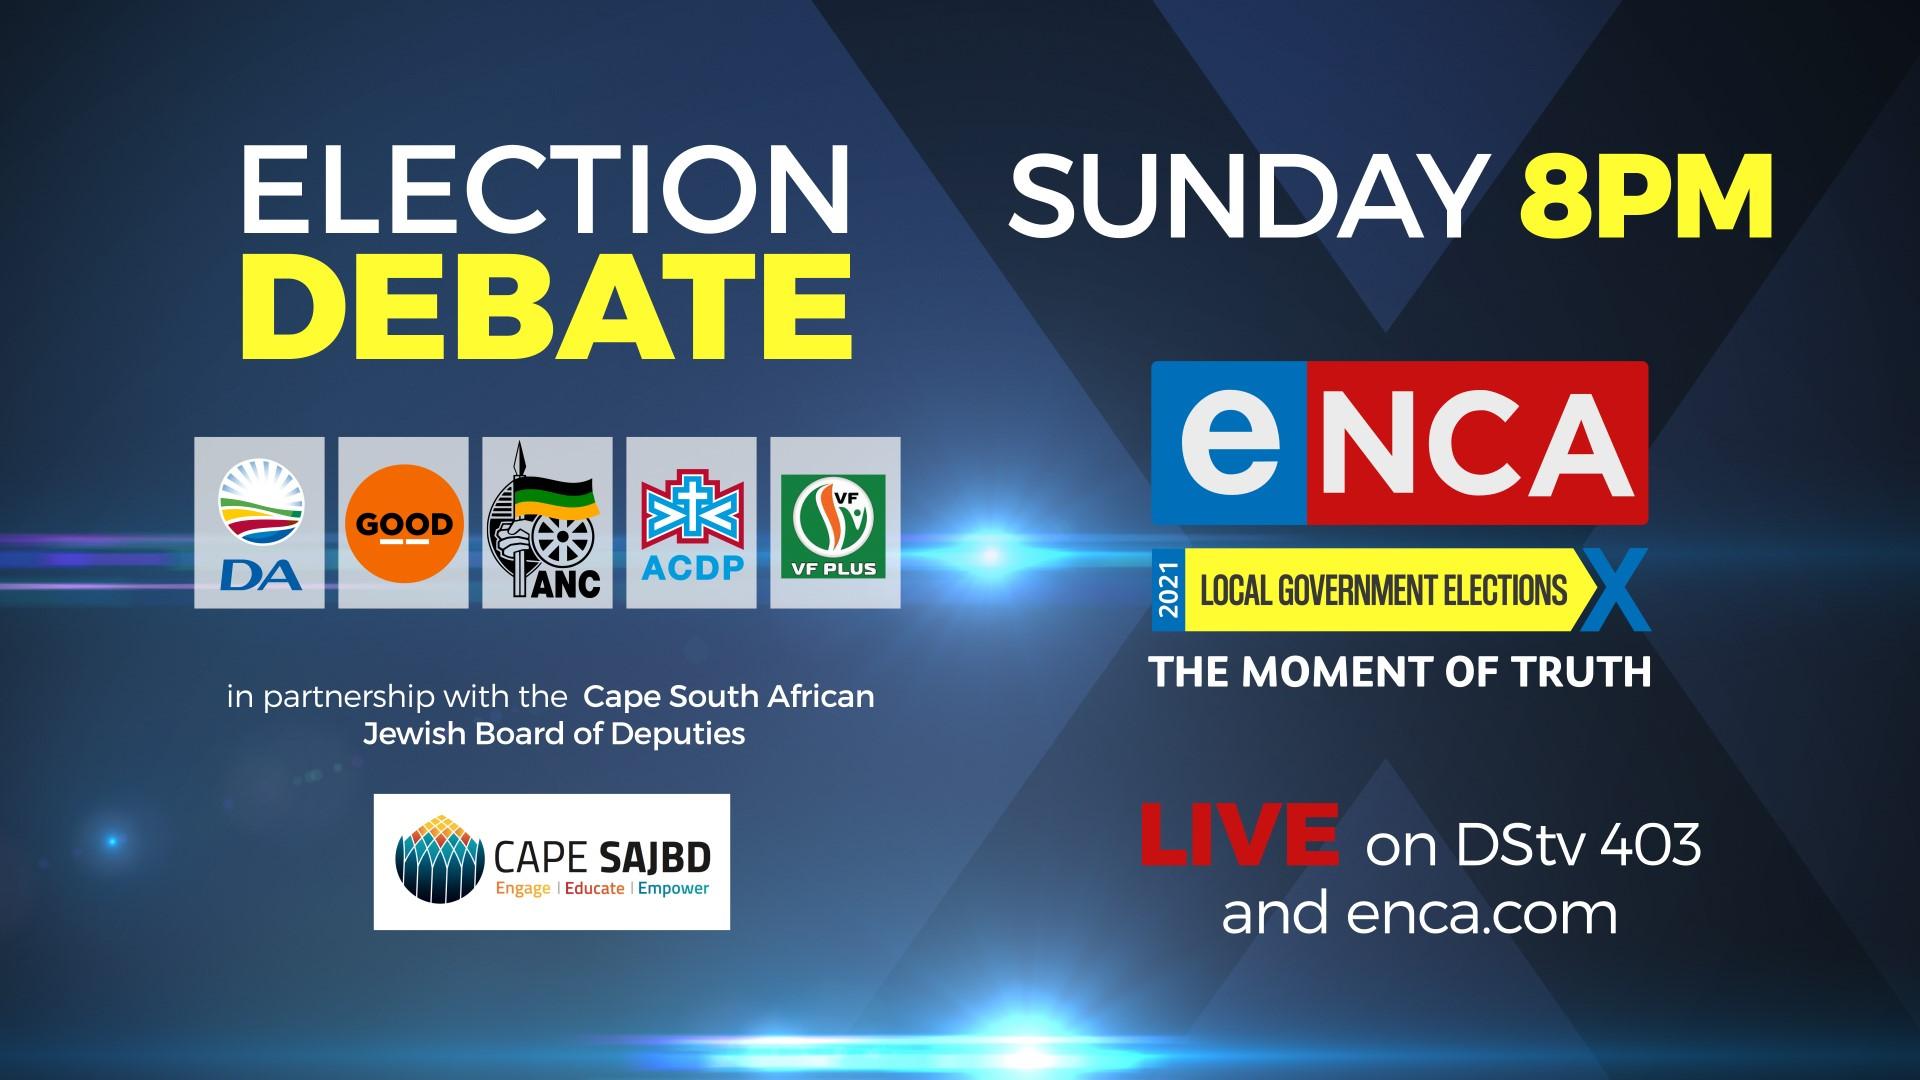 Cape SAJBD and eNCA Election Debate